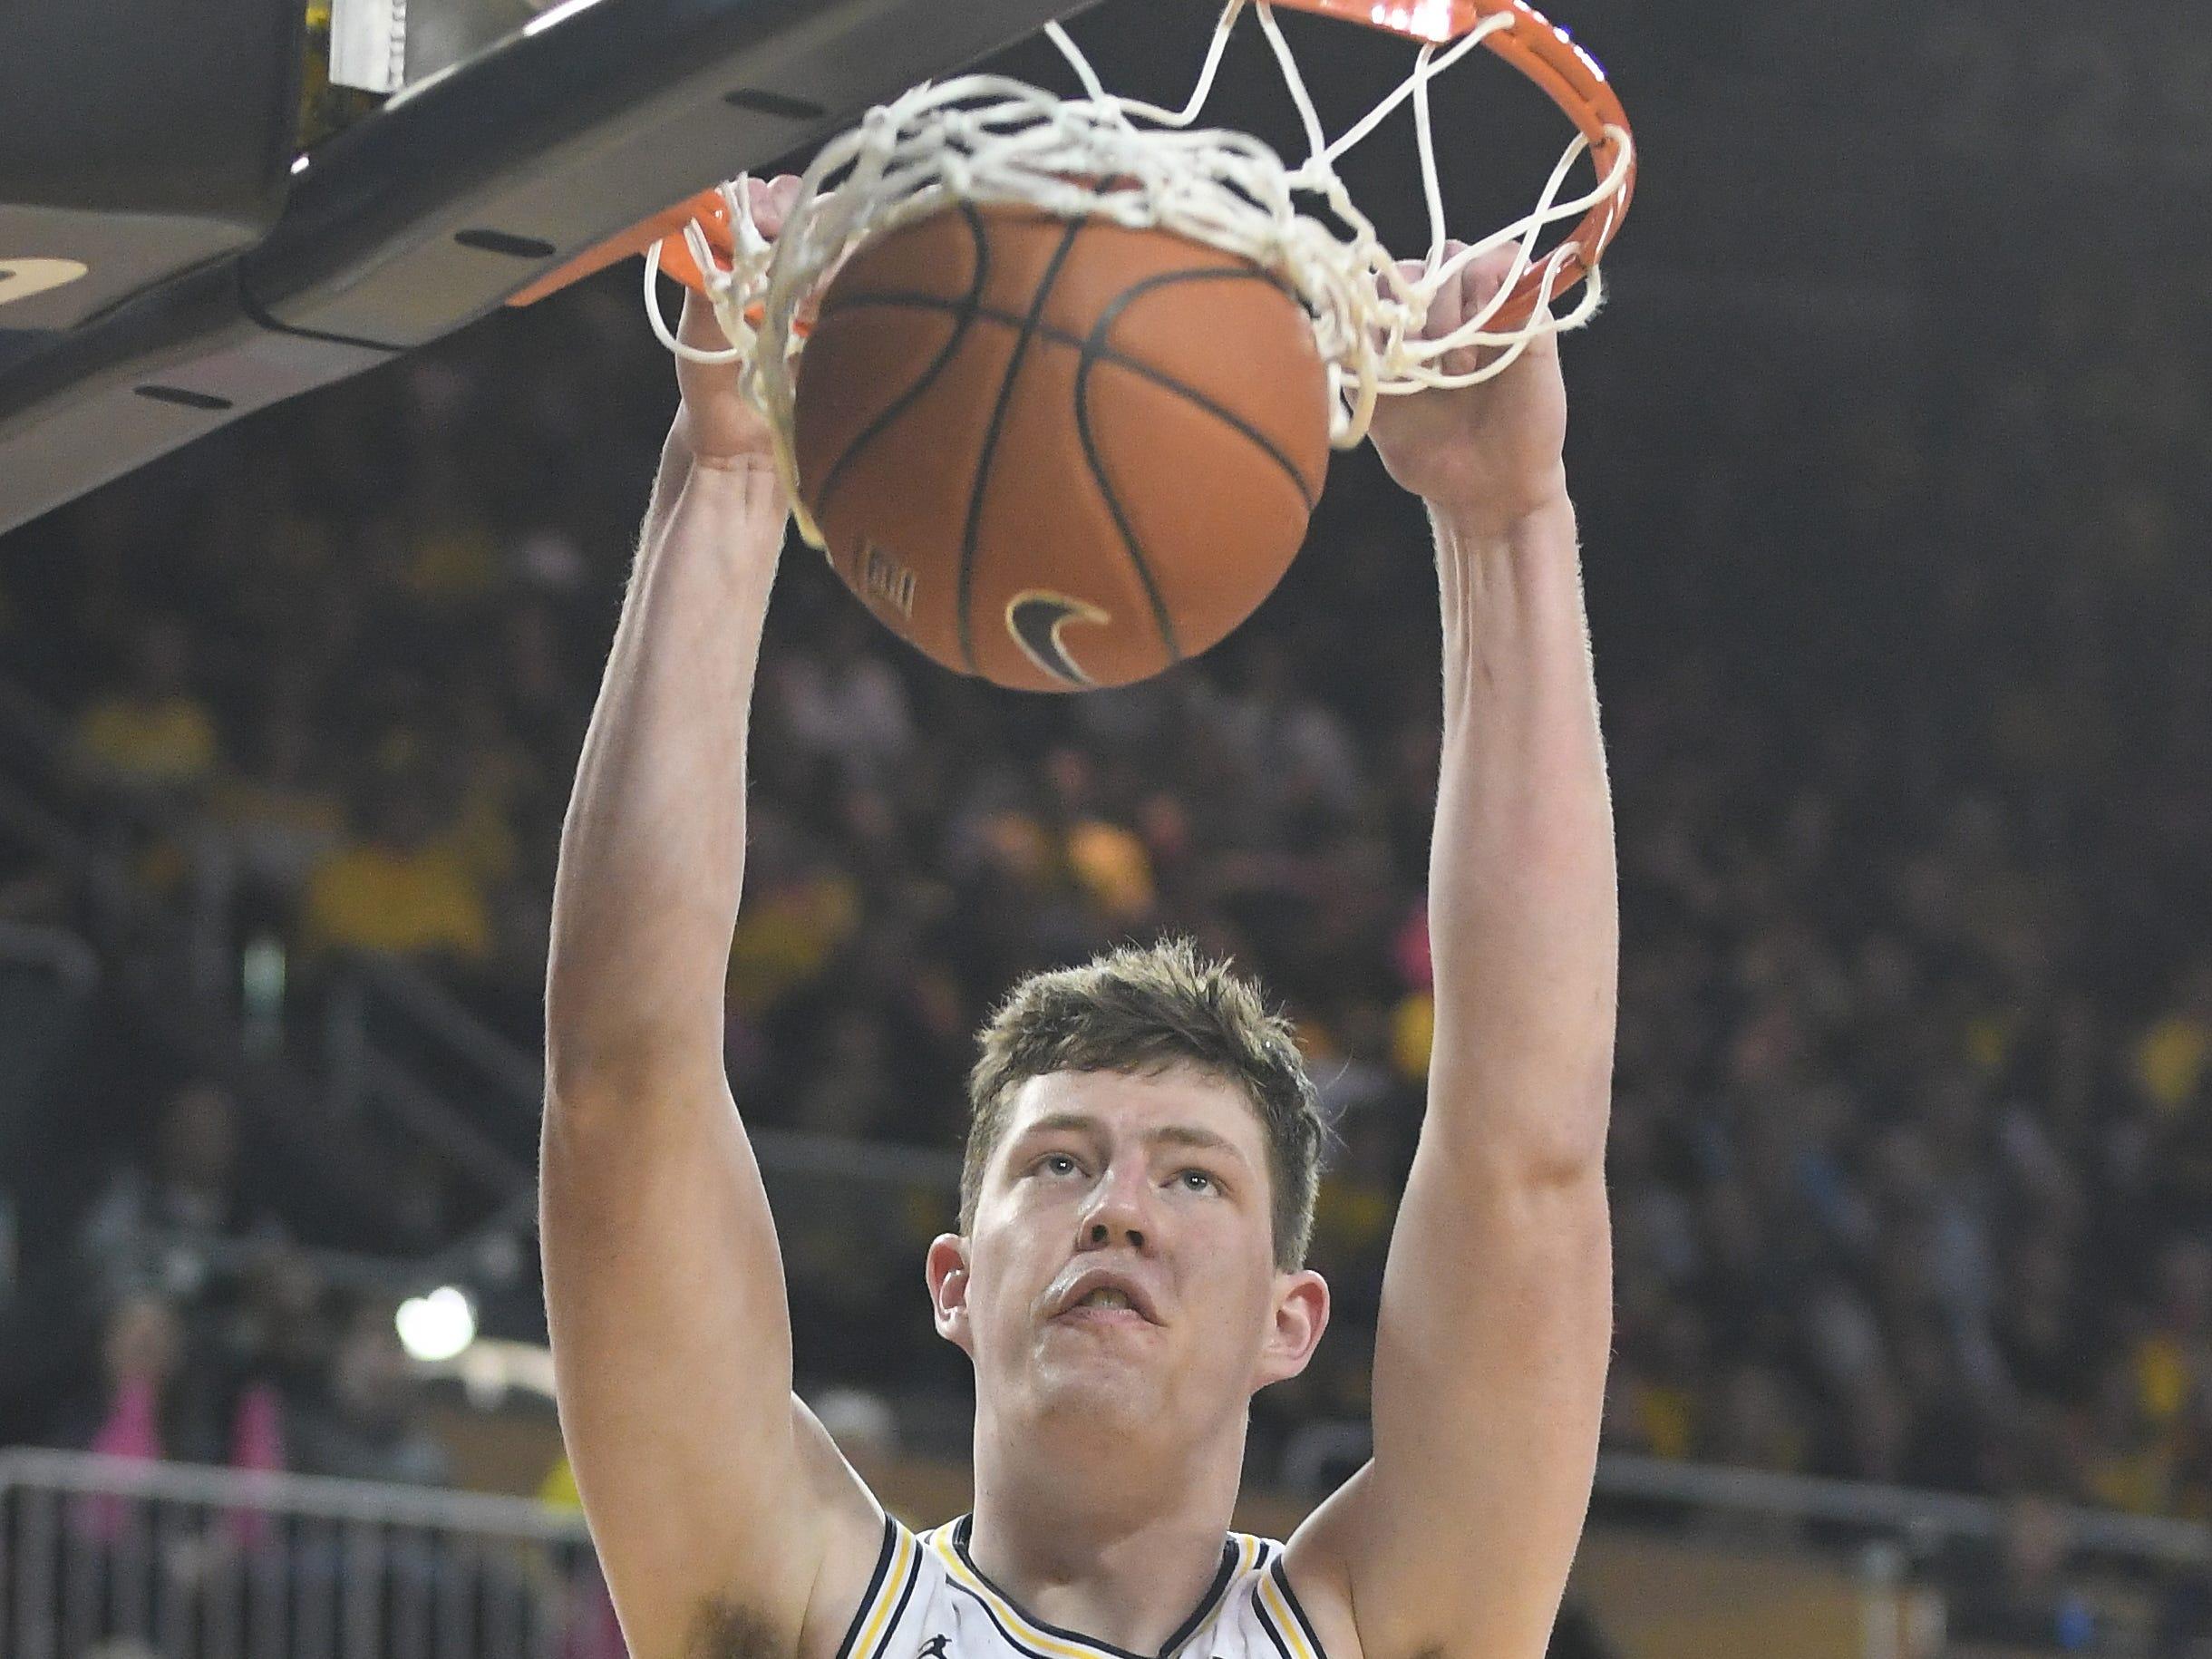 Michigan's Jon Teske slams home a dunk in the second half.